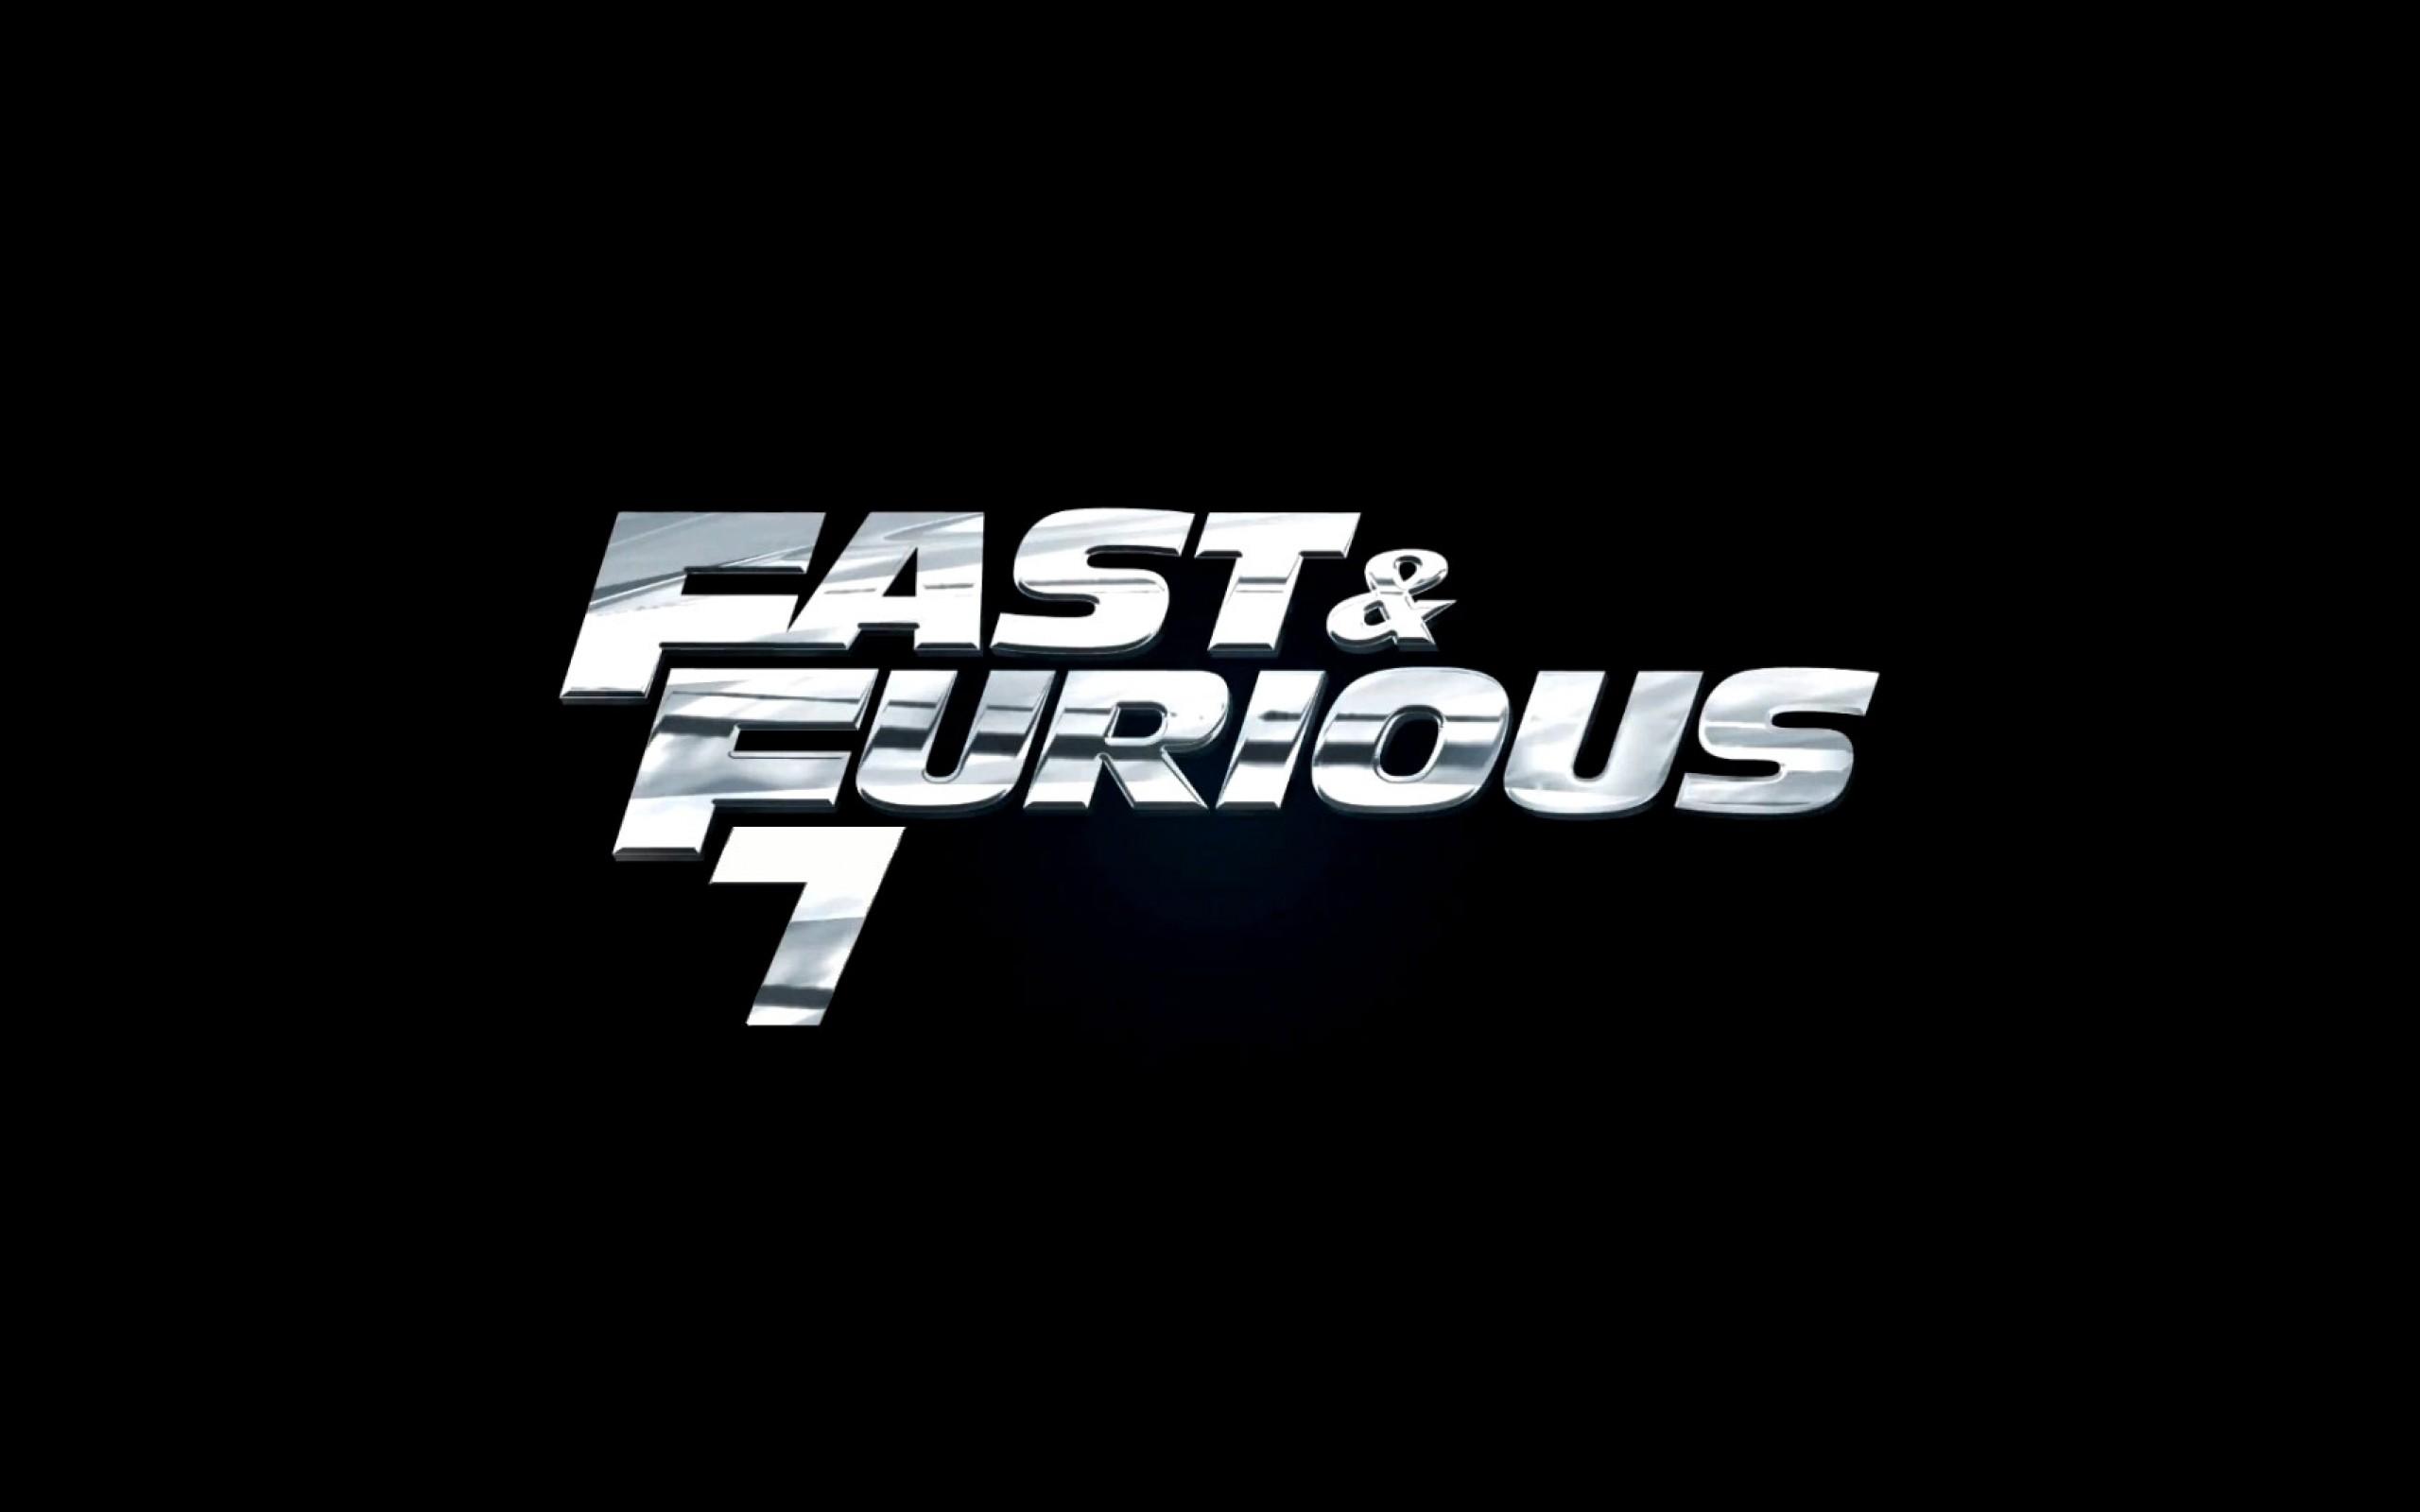 Fast And Furious 7 Wallpaper 8 Wallpapersbq